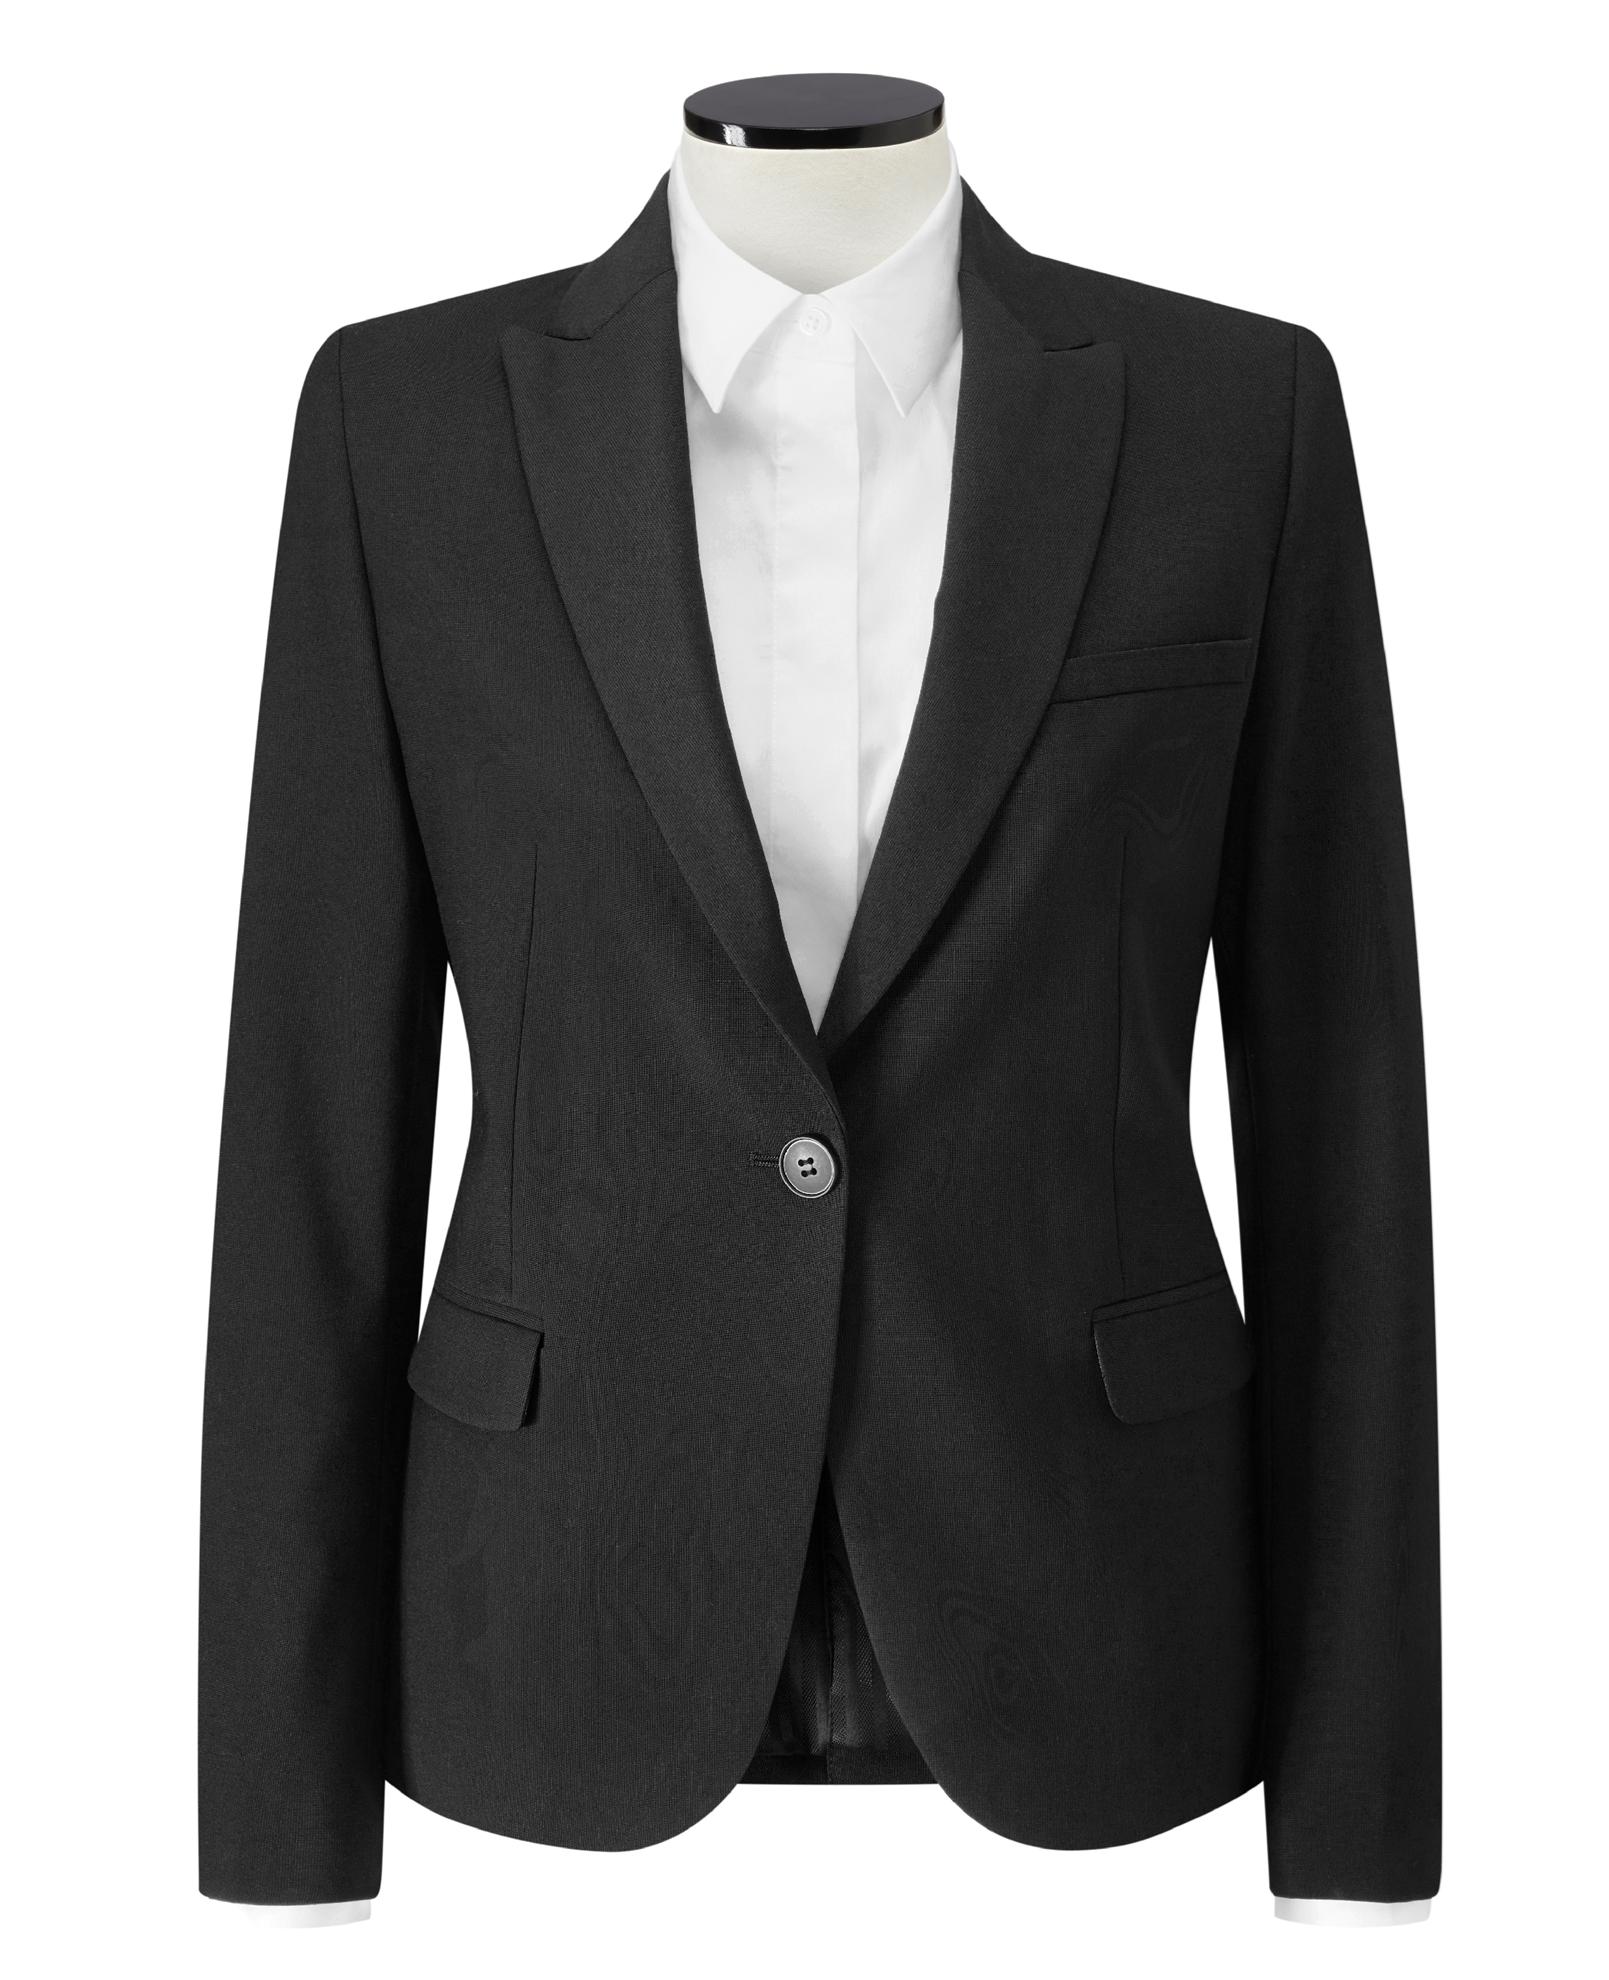 Picture of Ladies Hoxton Slim Fit Jacket -Black